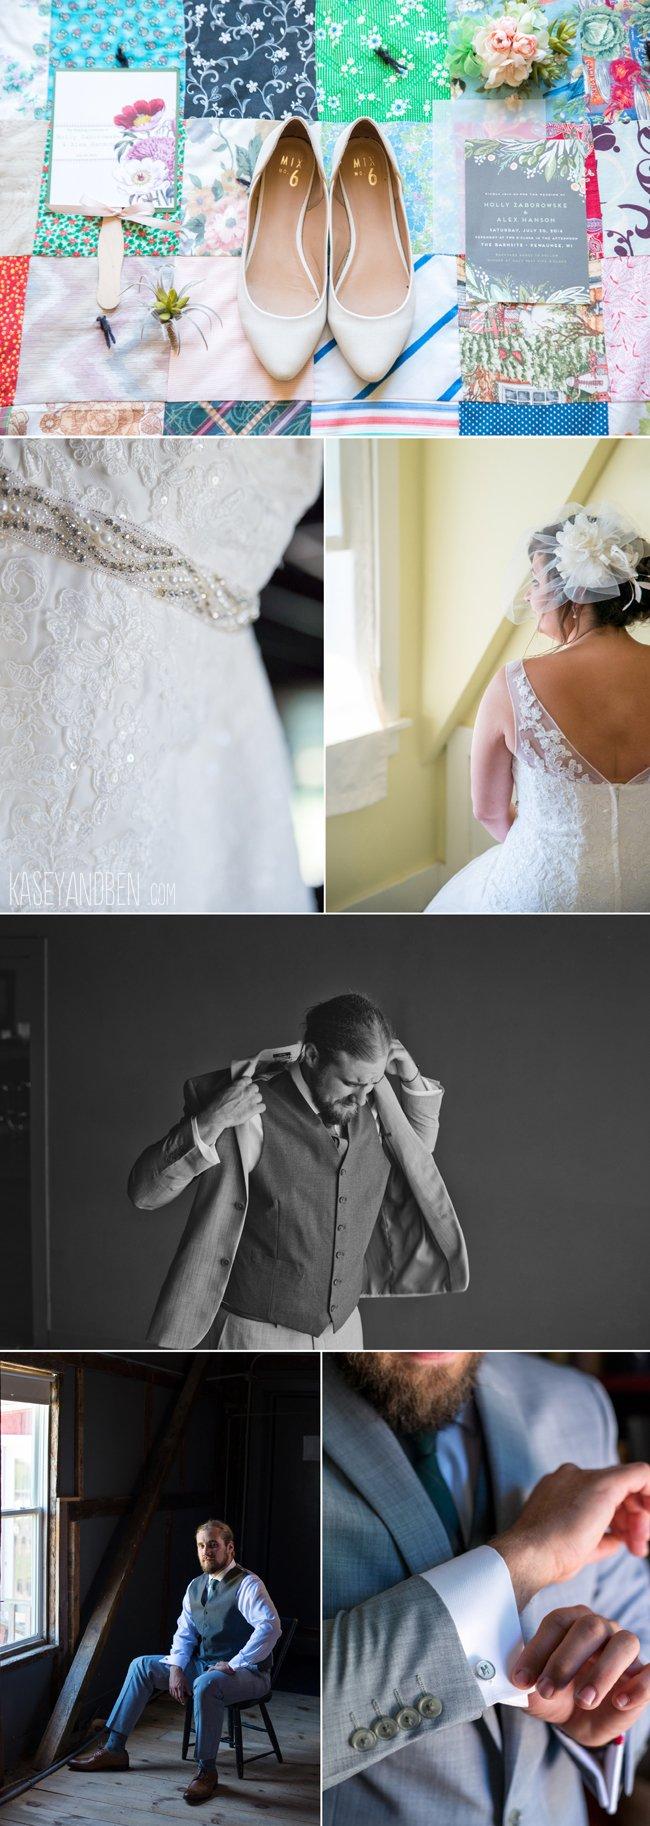 kewaunee-barnsite-wedding-photography-green-bay-photographer-rustic-summer-barn-outside-wisconsin-lake-michigan-waterfront-1